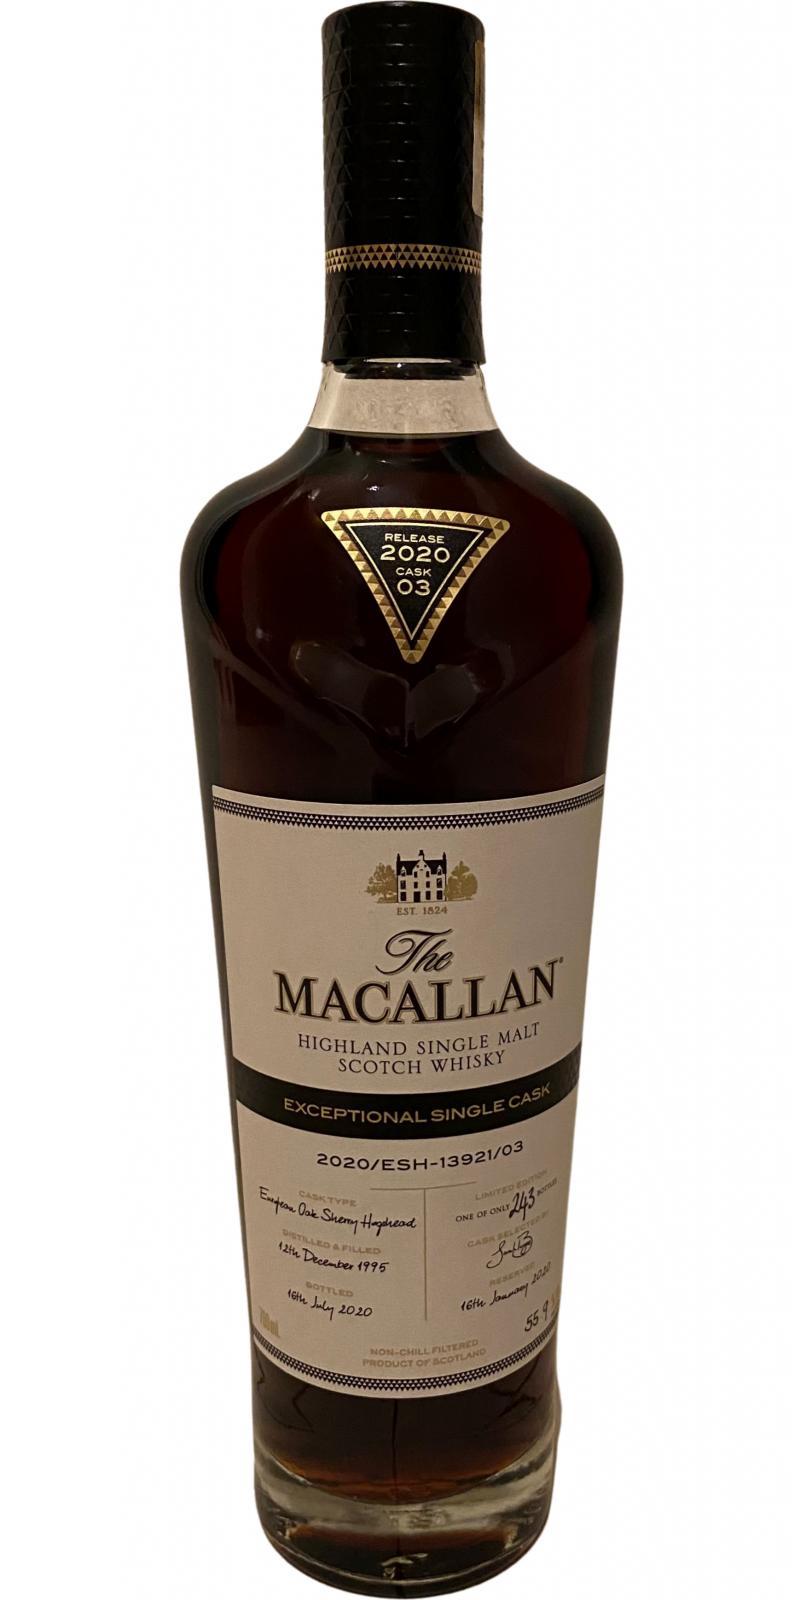 Macallan 2020/ESH-13921/03